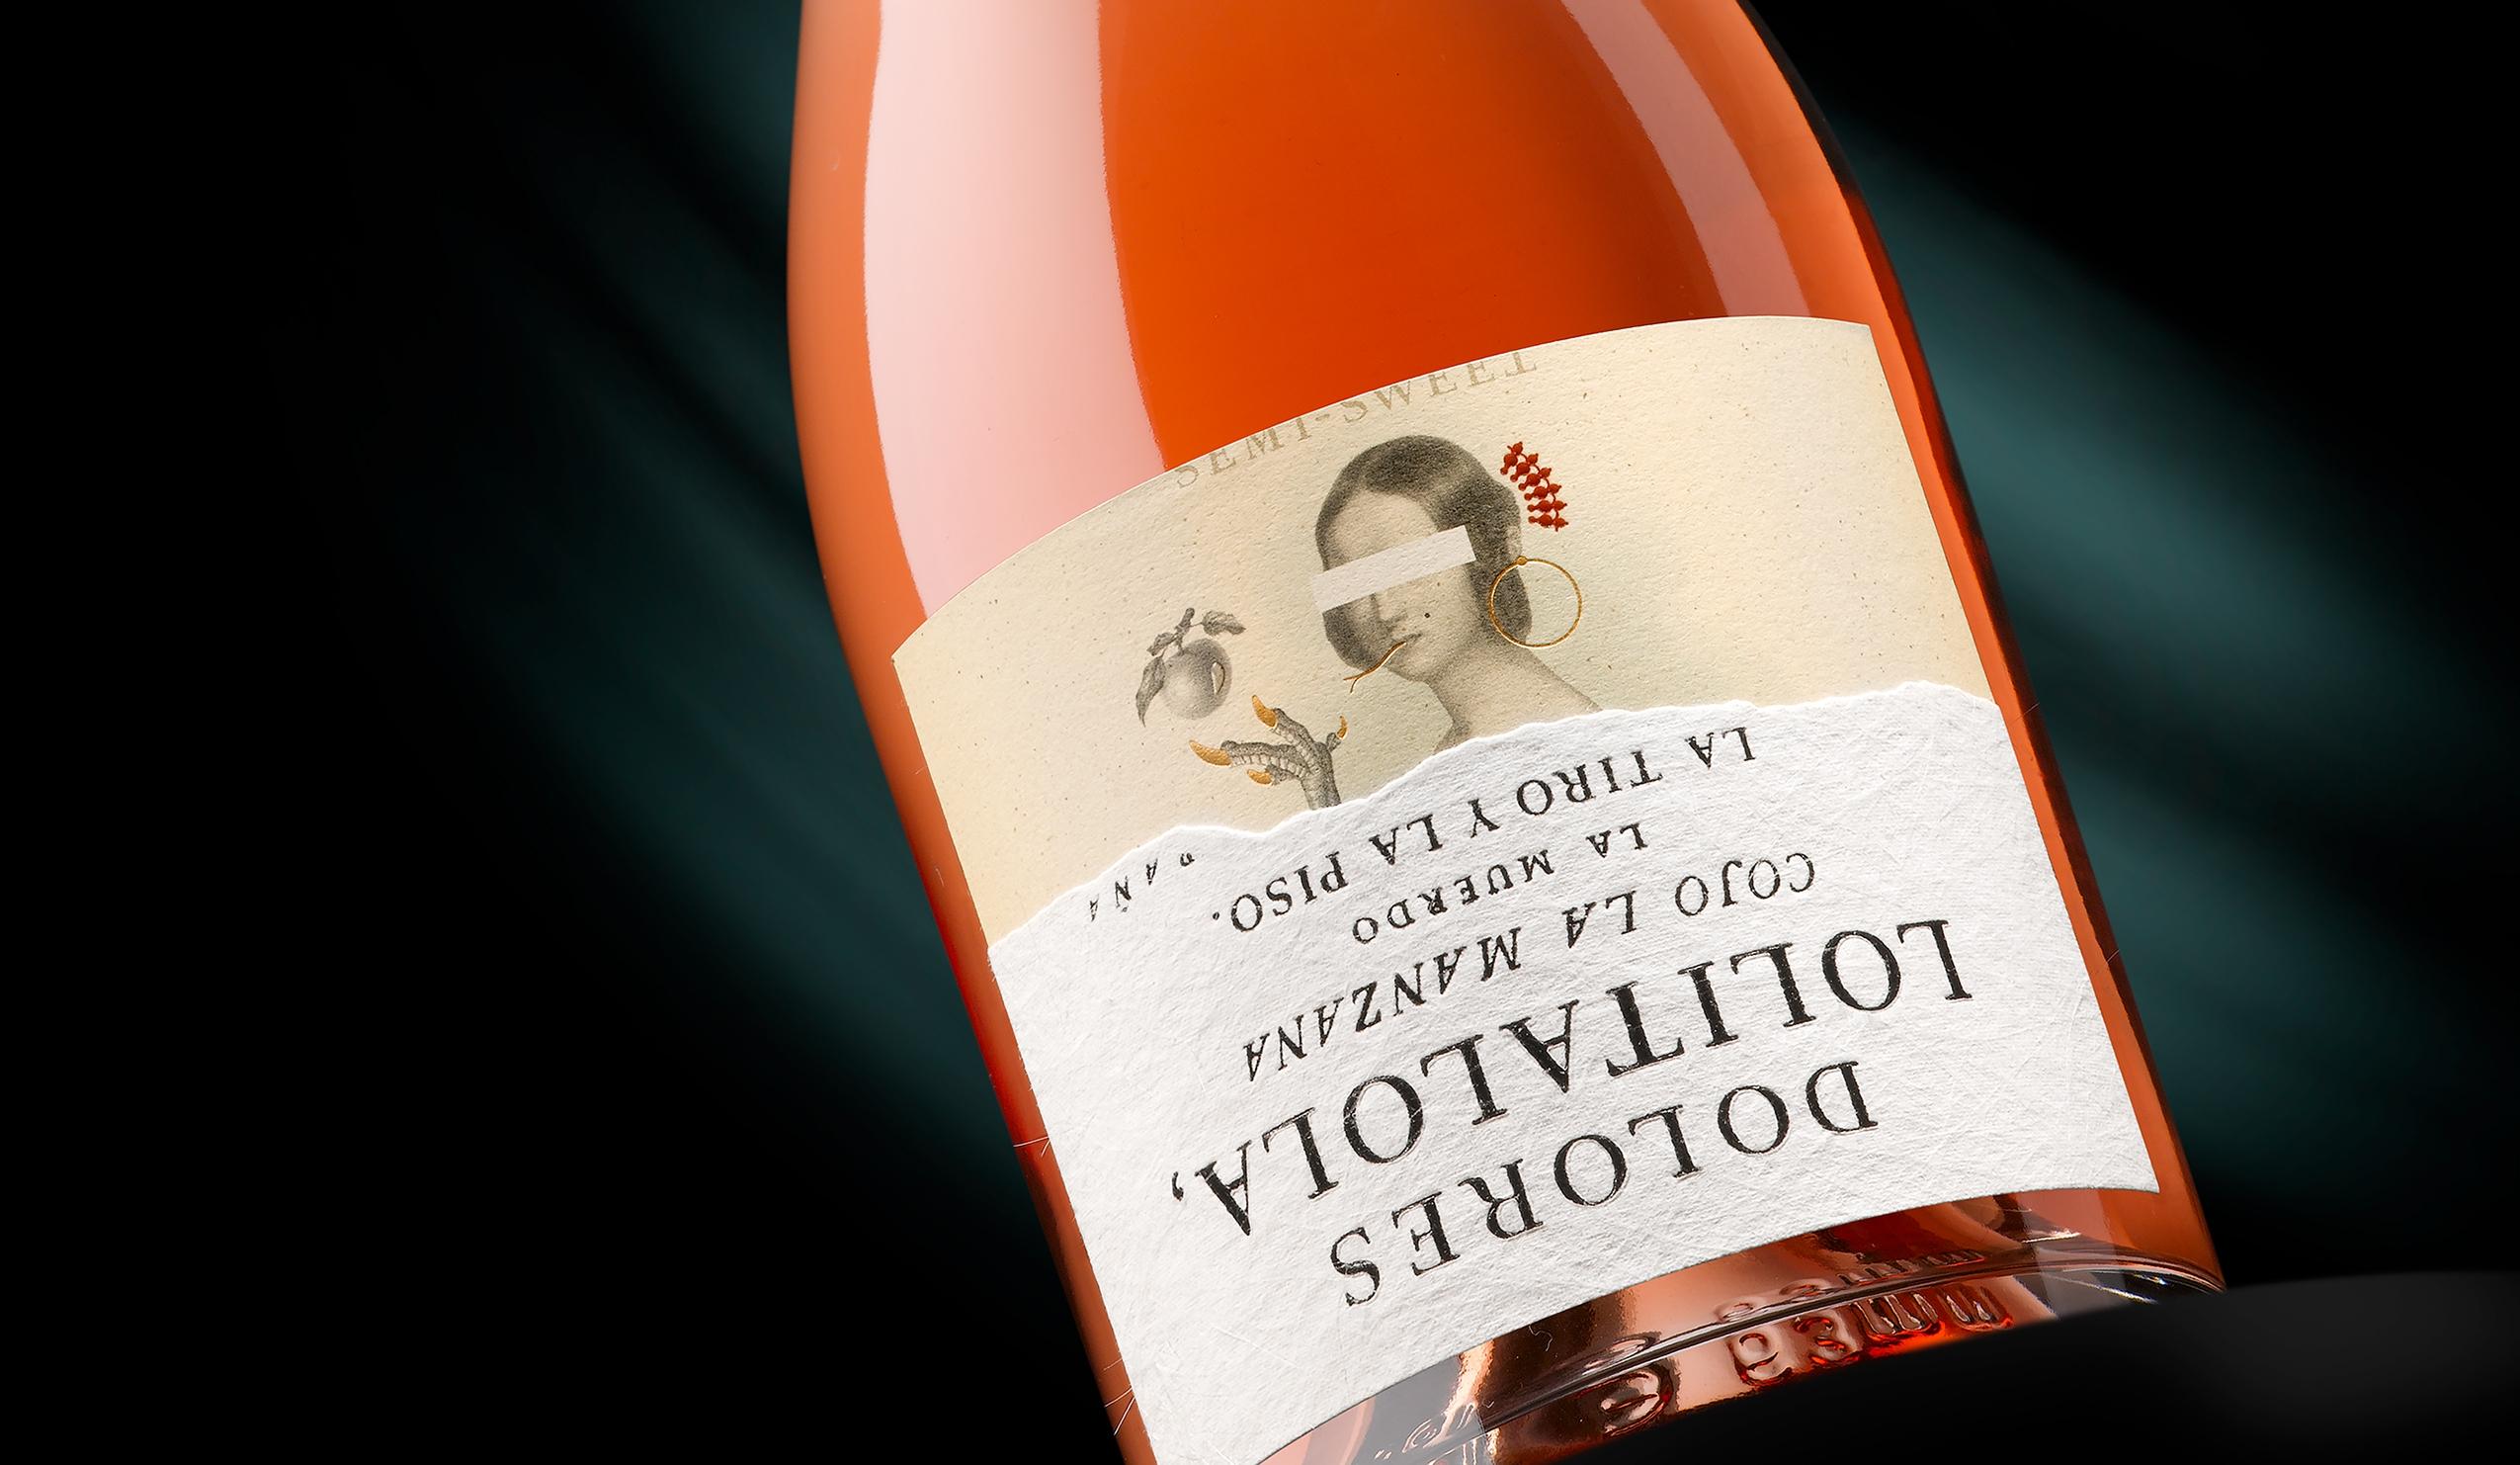 Etiqueta Dolores Lolita Lola de packaging de vino